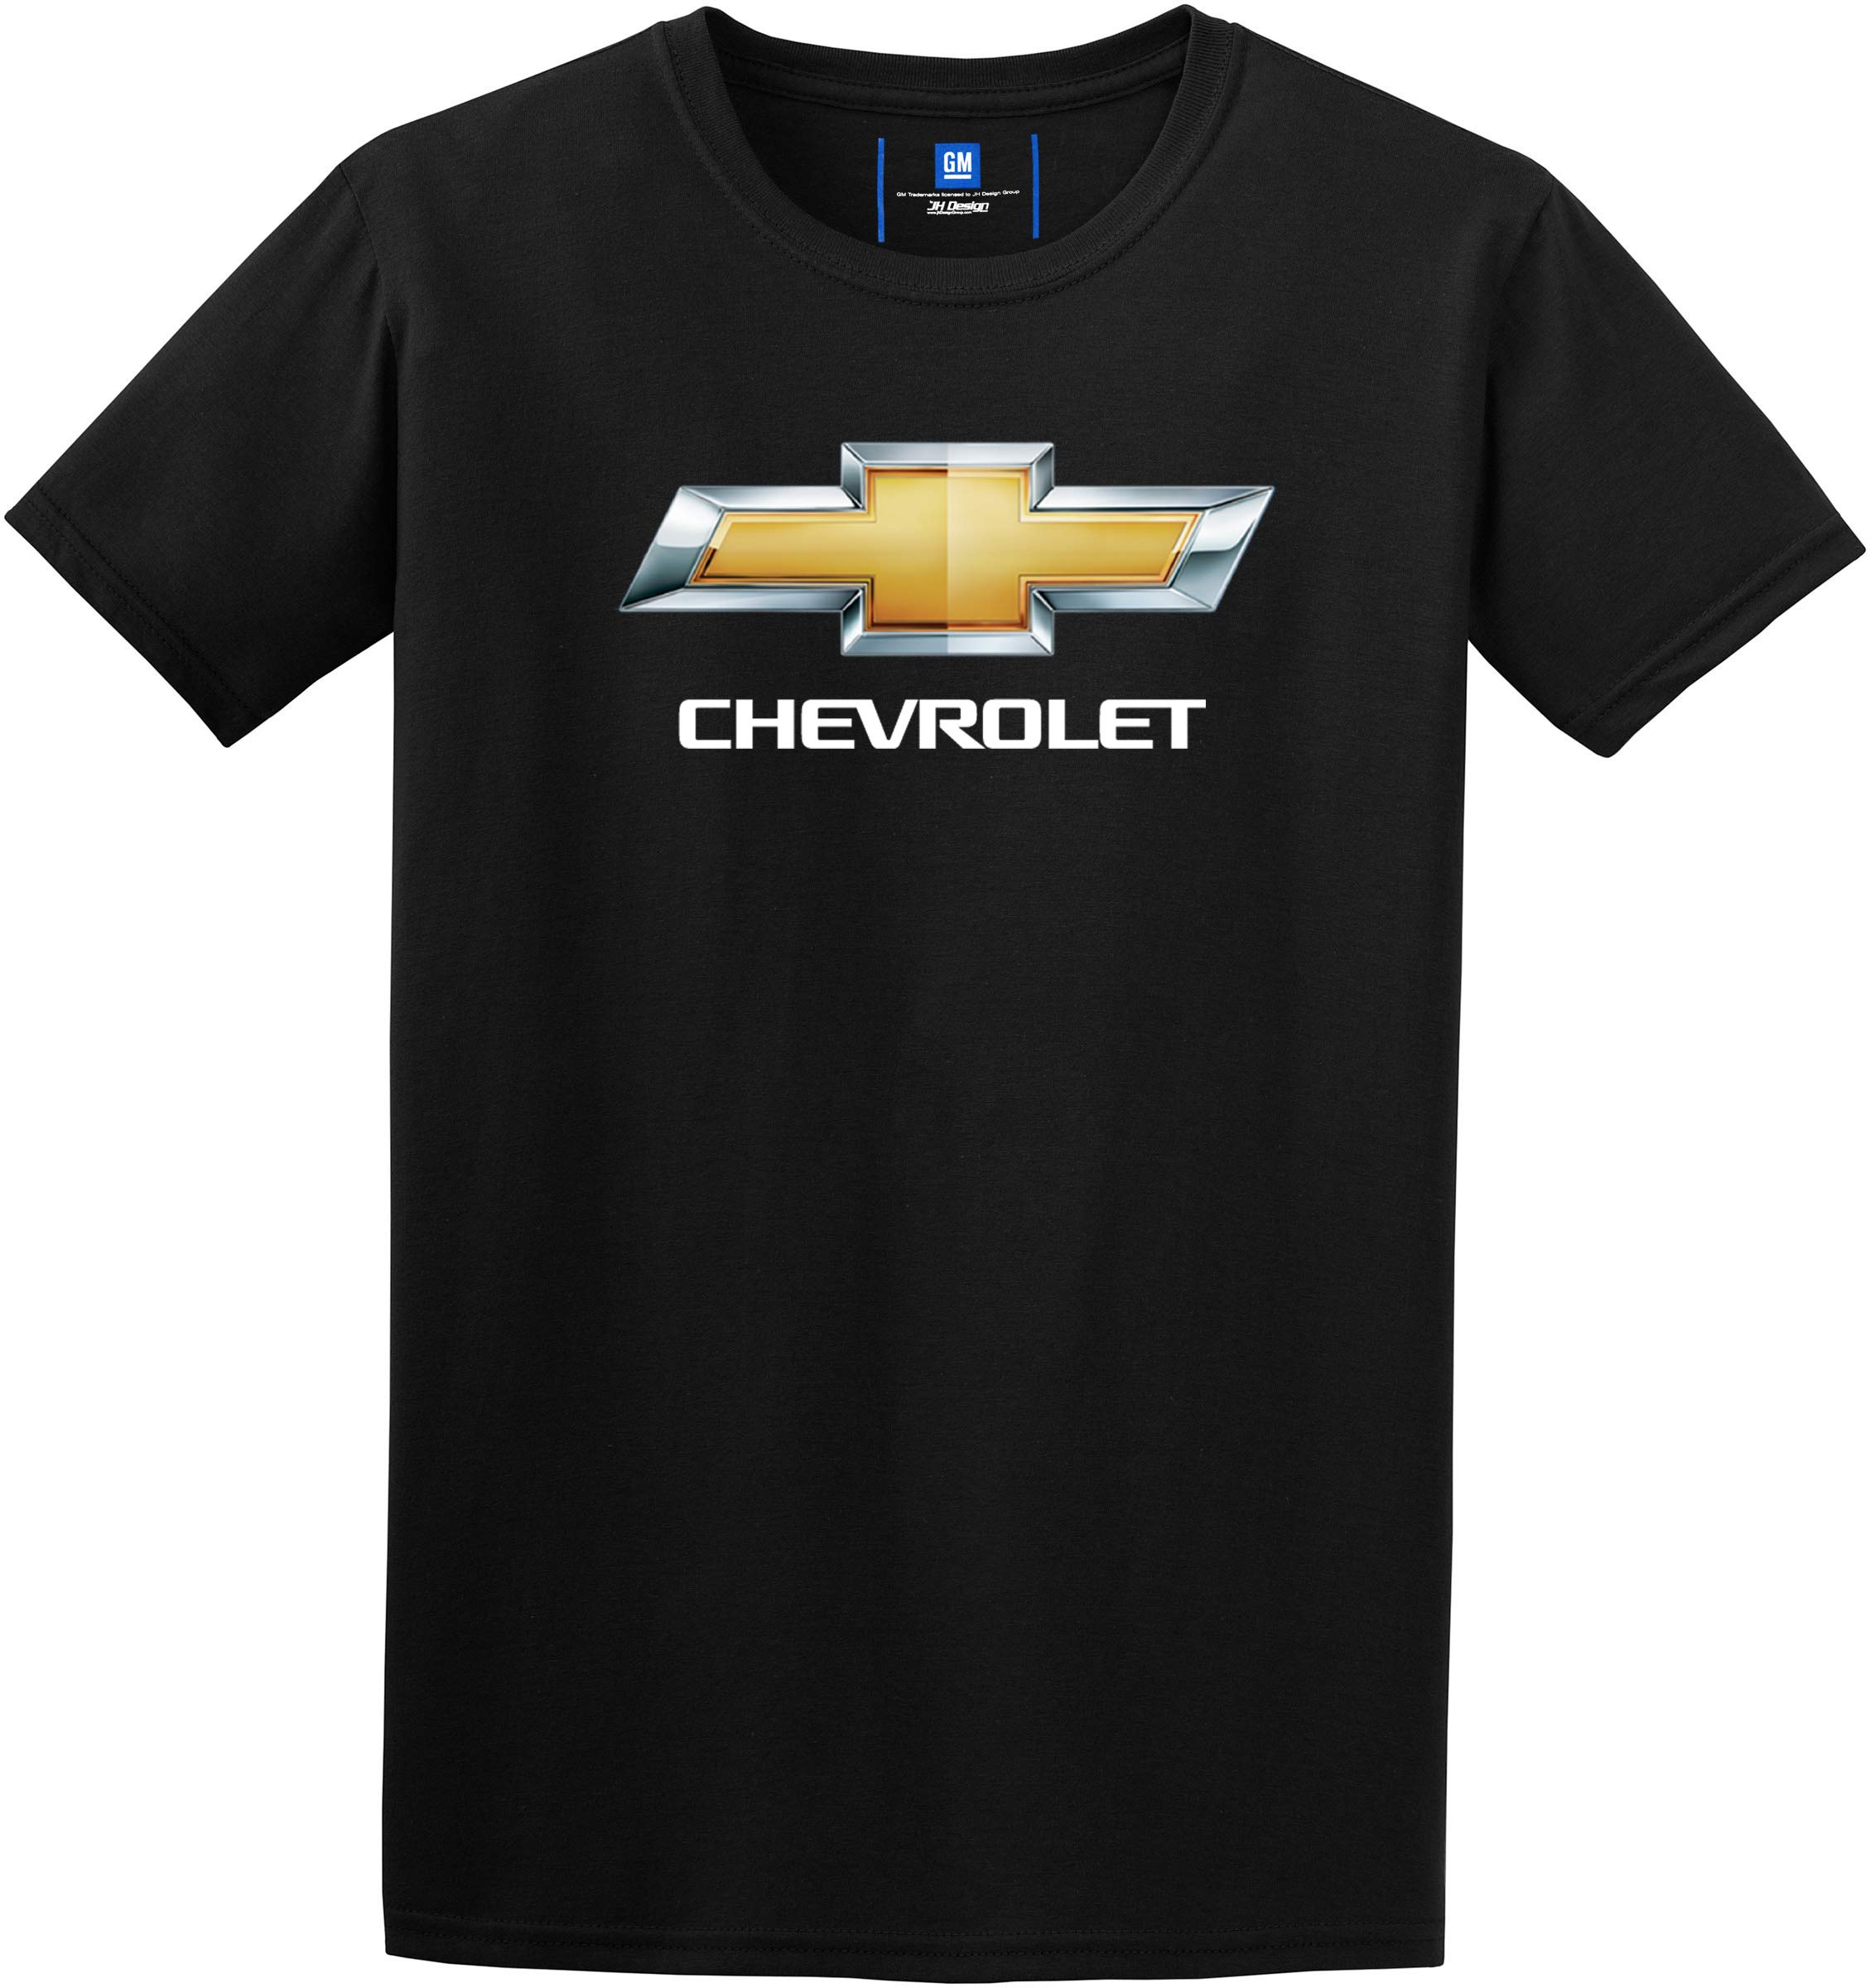 JH DESIGN GROUP Mens Chevy Bow Tie Black Crew Neck T-Shirt